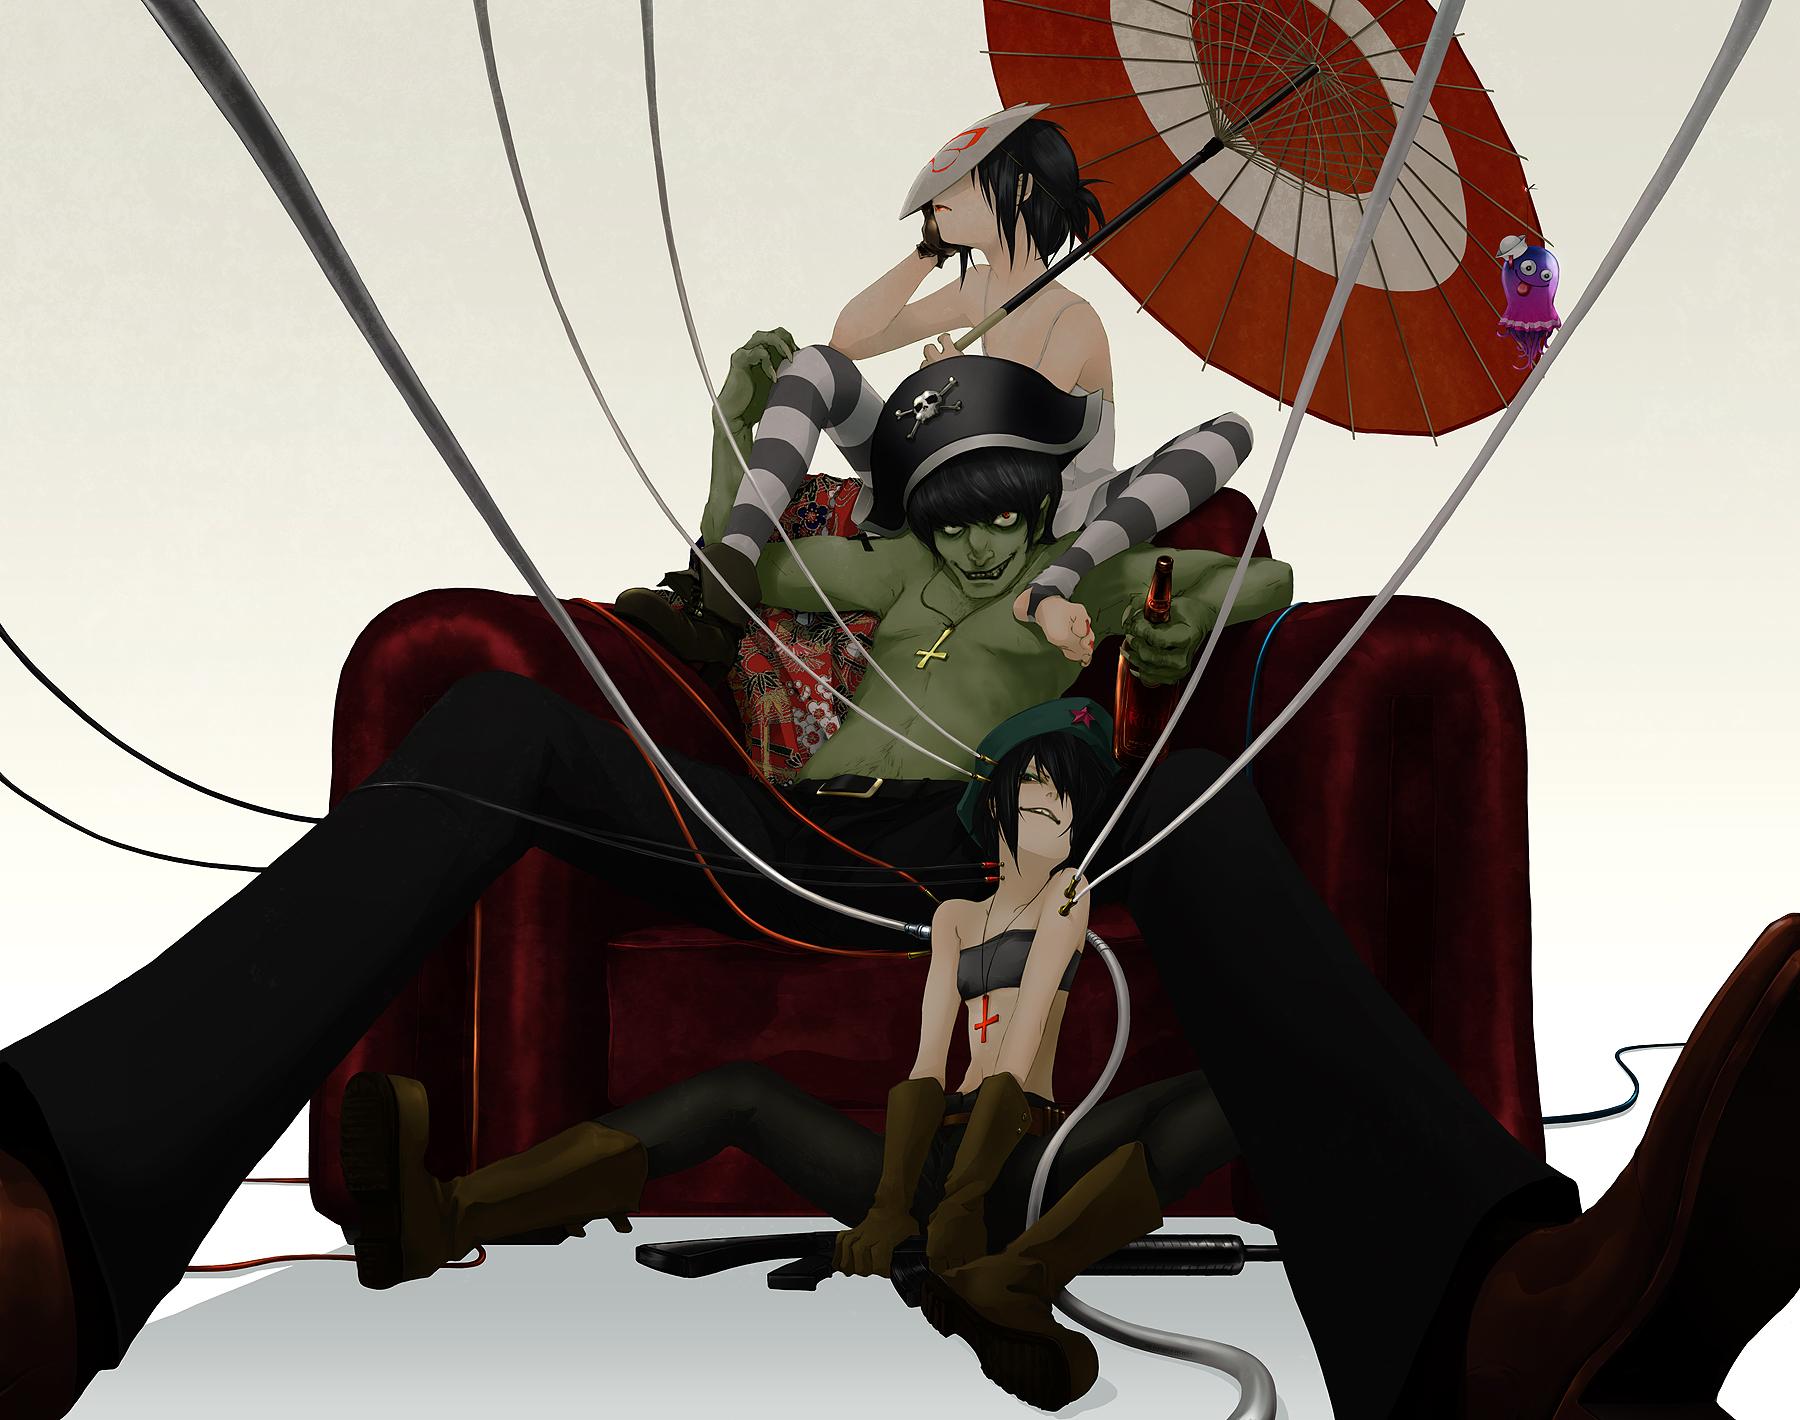 Anime Character 2d : Gorillaz band image  zerochan anime board